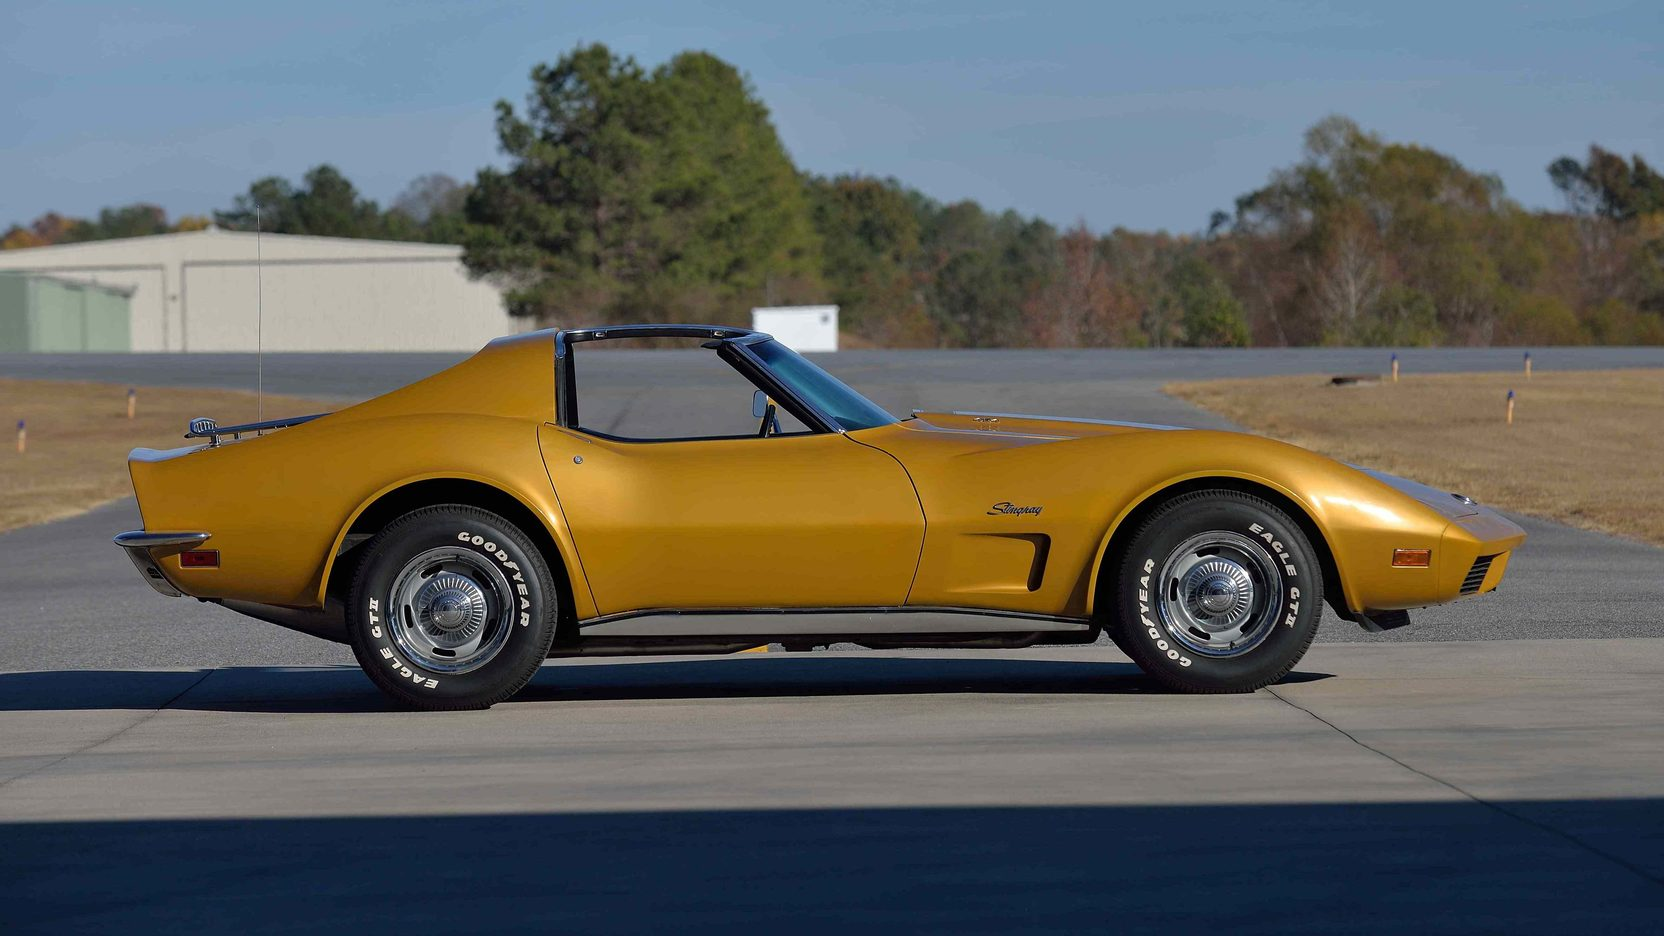 1974 Chevrolet Corvette 454 big block side view